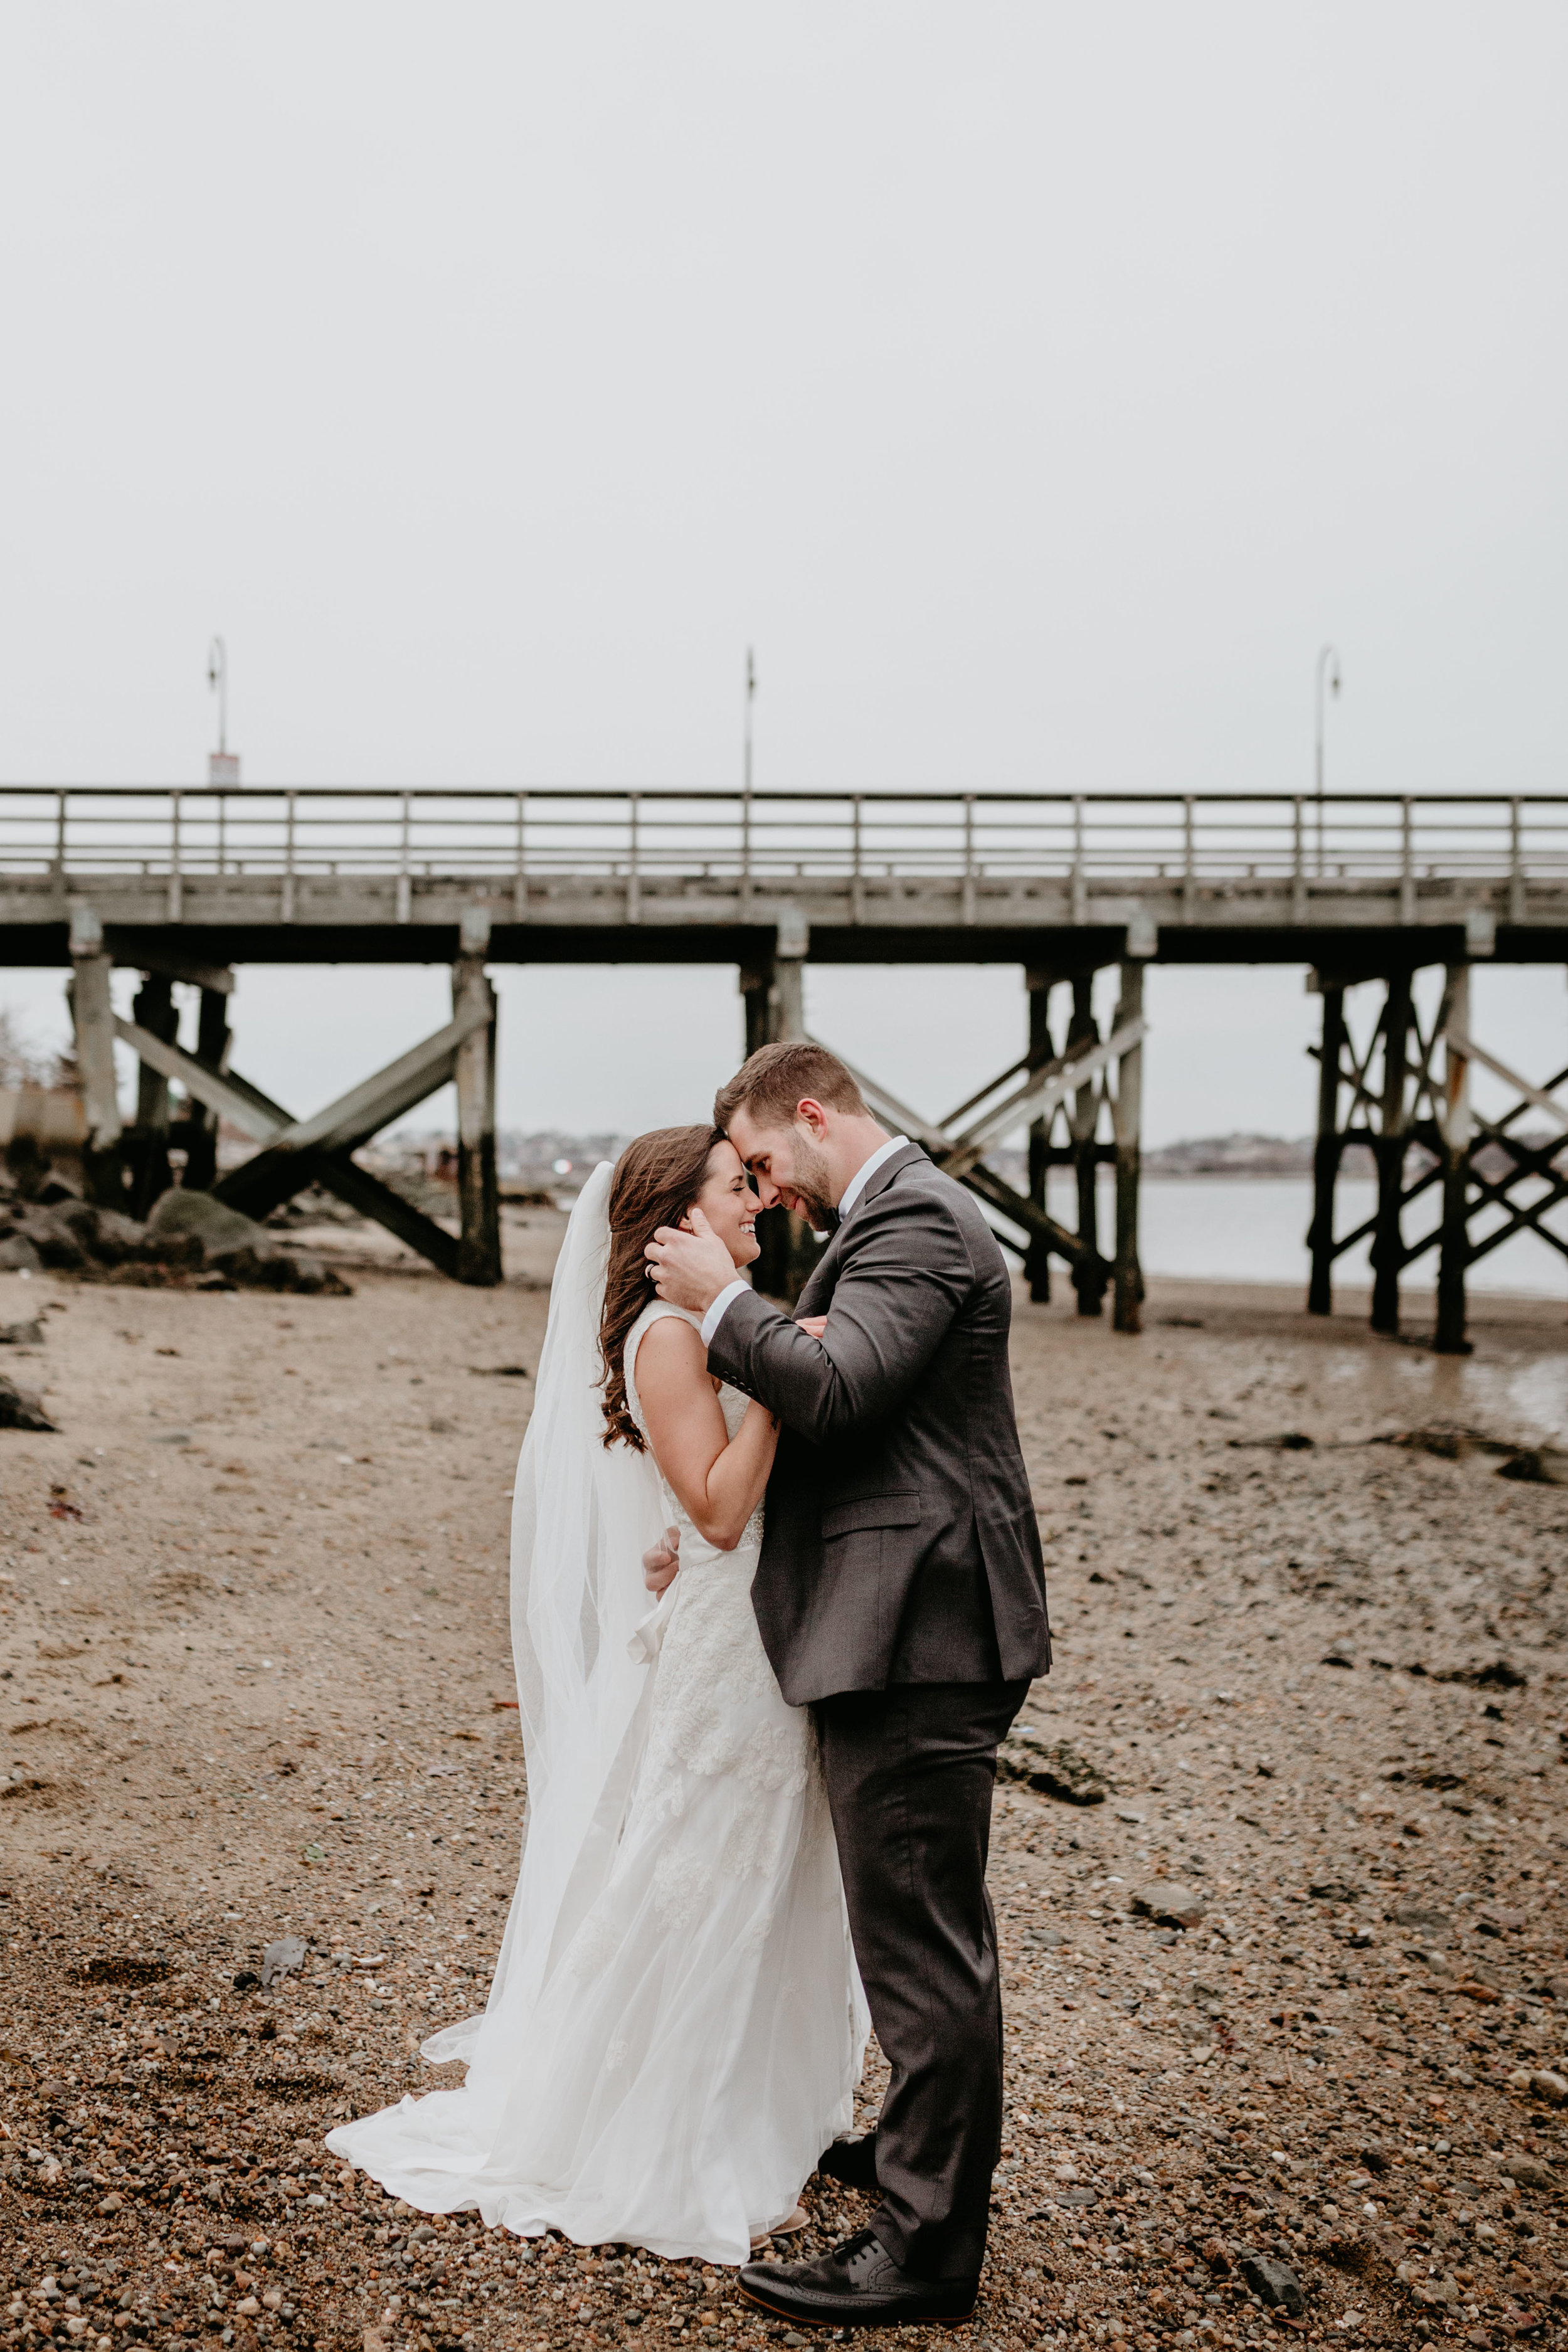 nicole-daacke-photography-boston-massachusetts-seaside-intimate-winter-wedding-photographer-40.jpg